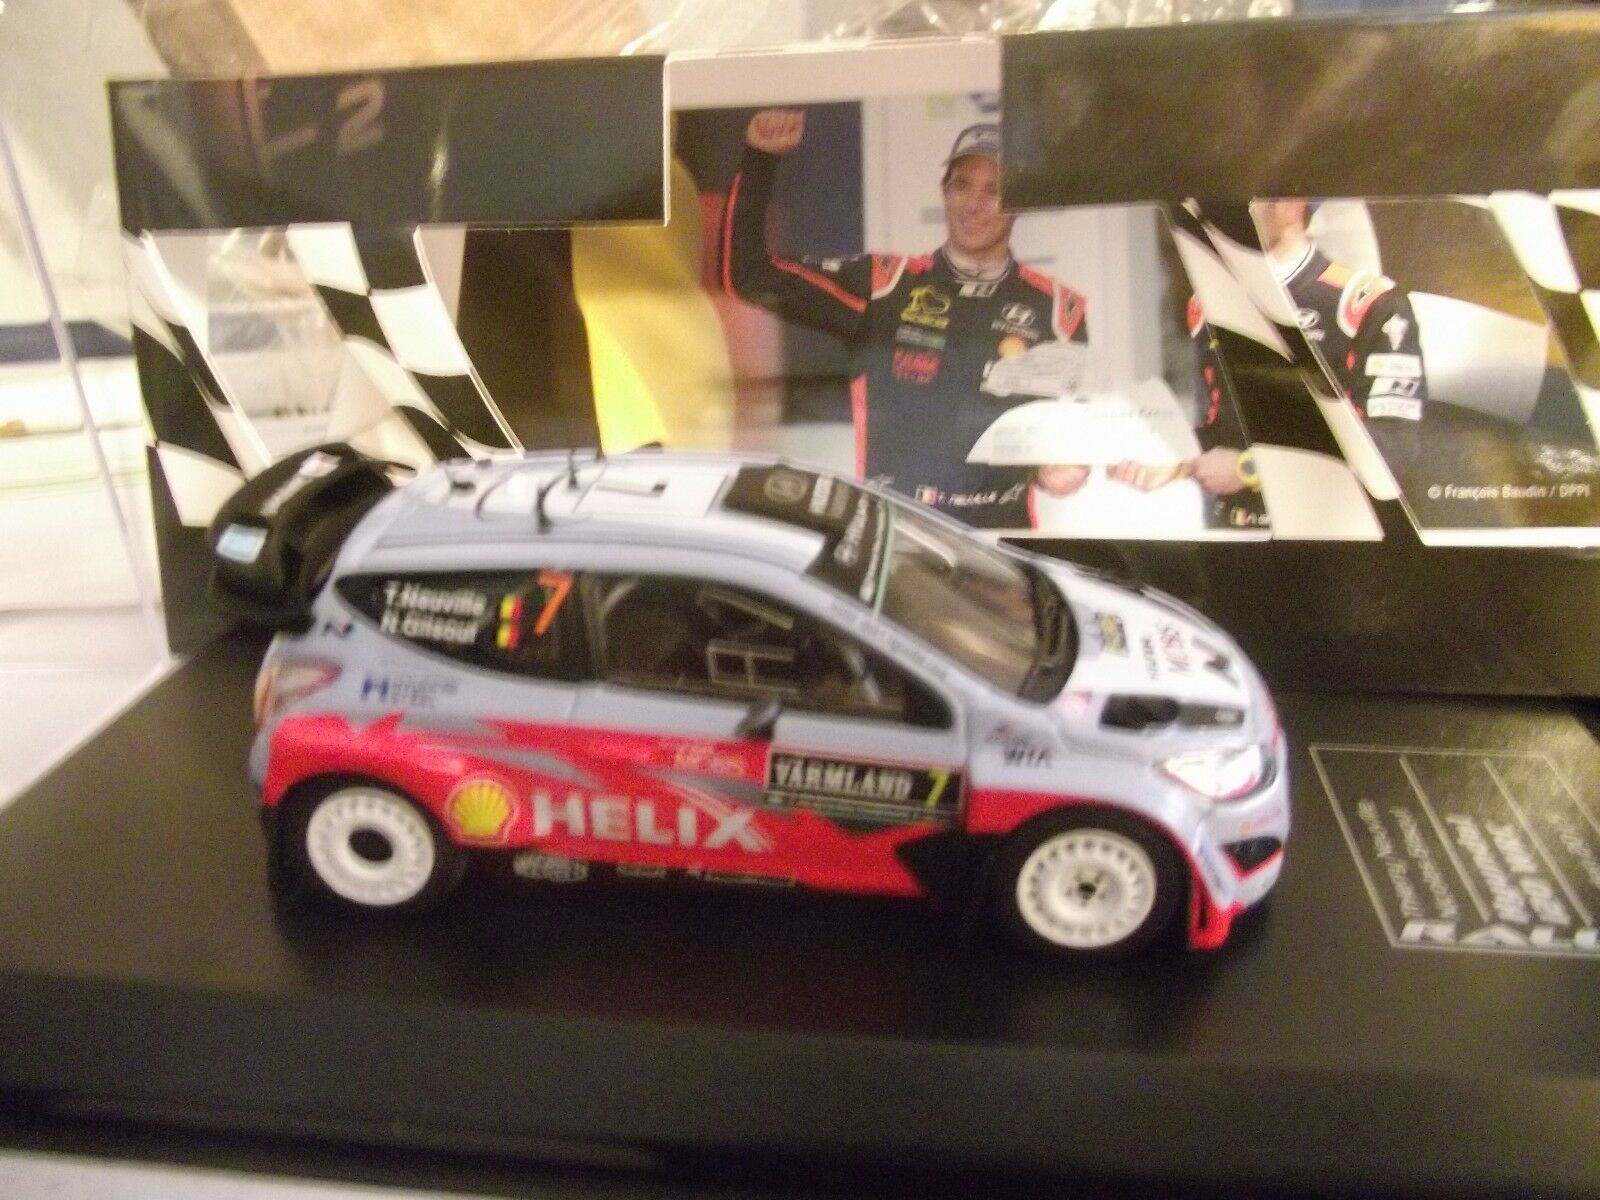 HYUNDAI i20 wrc rally sweden 2015 Neuville 1 43 DCC DCC DCC IXO 15 2616af